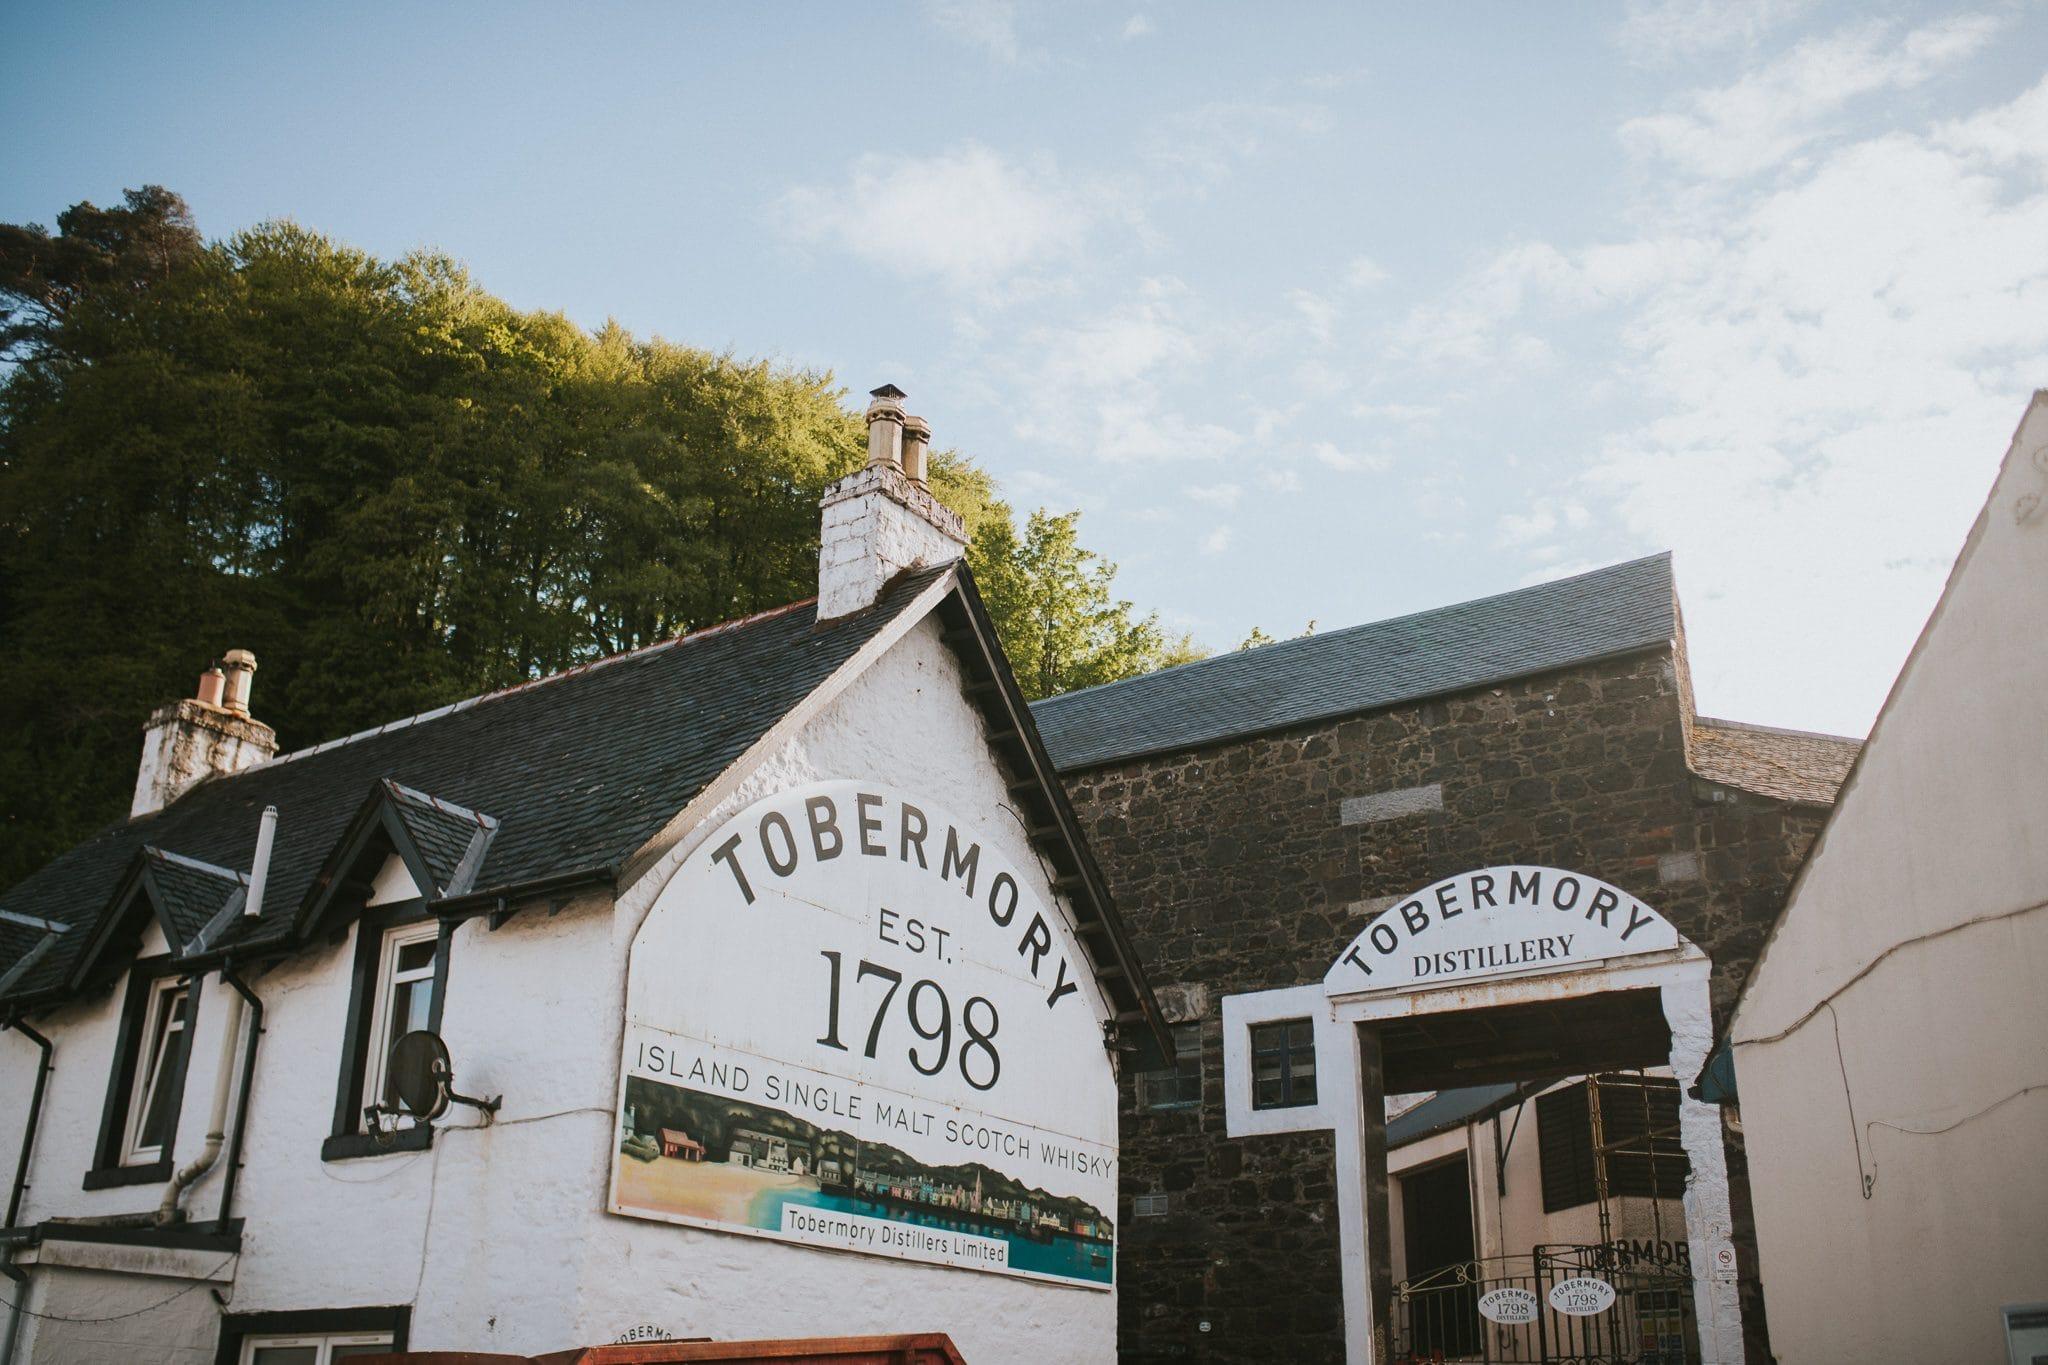 Tobermory Distillery Visitor Centre